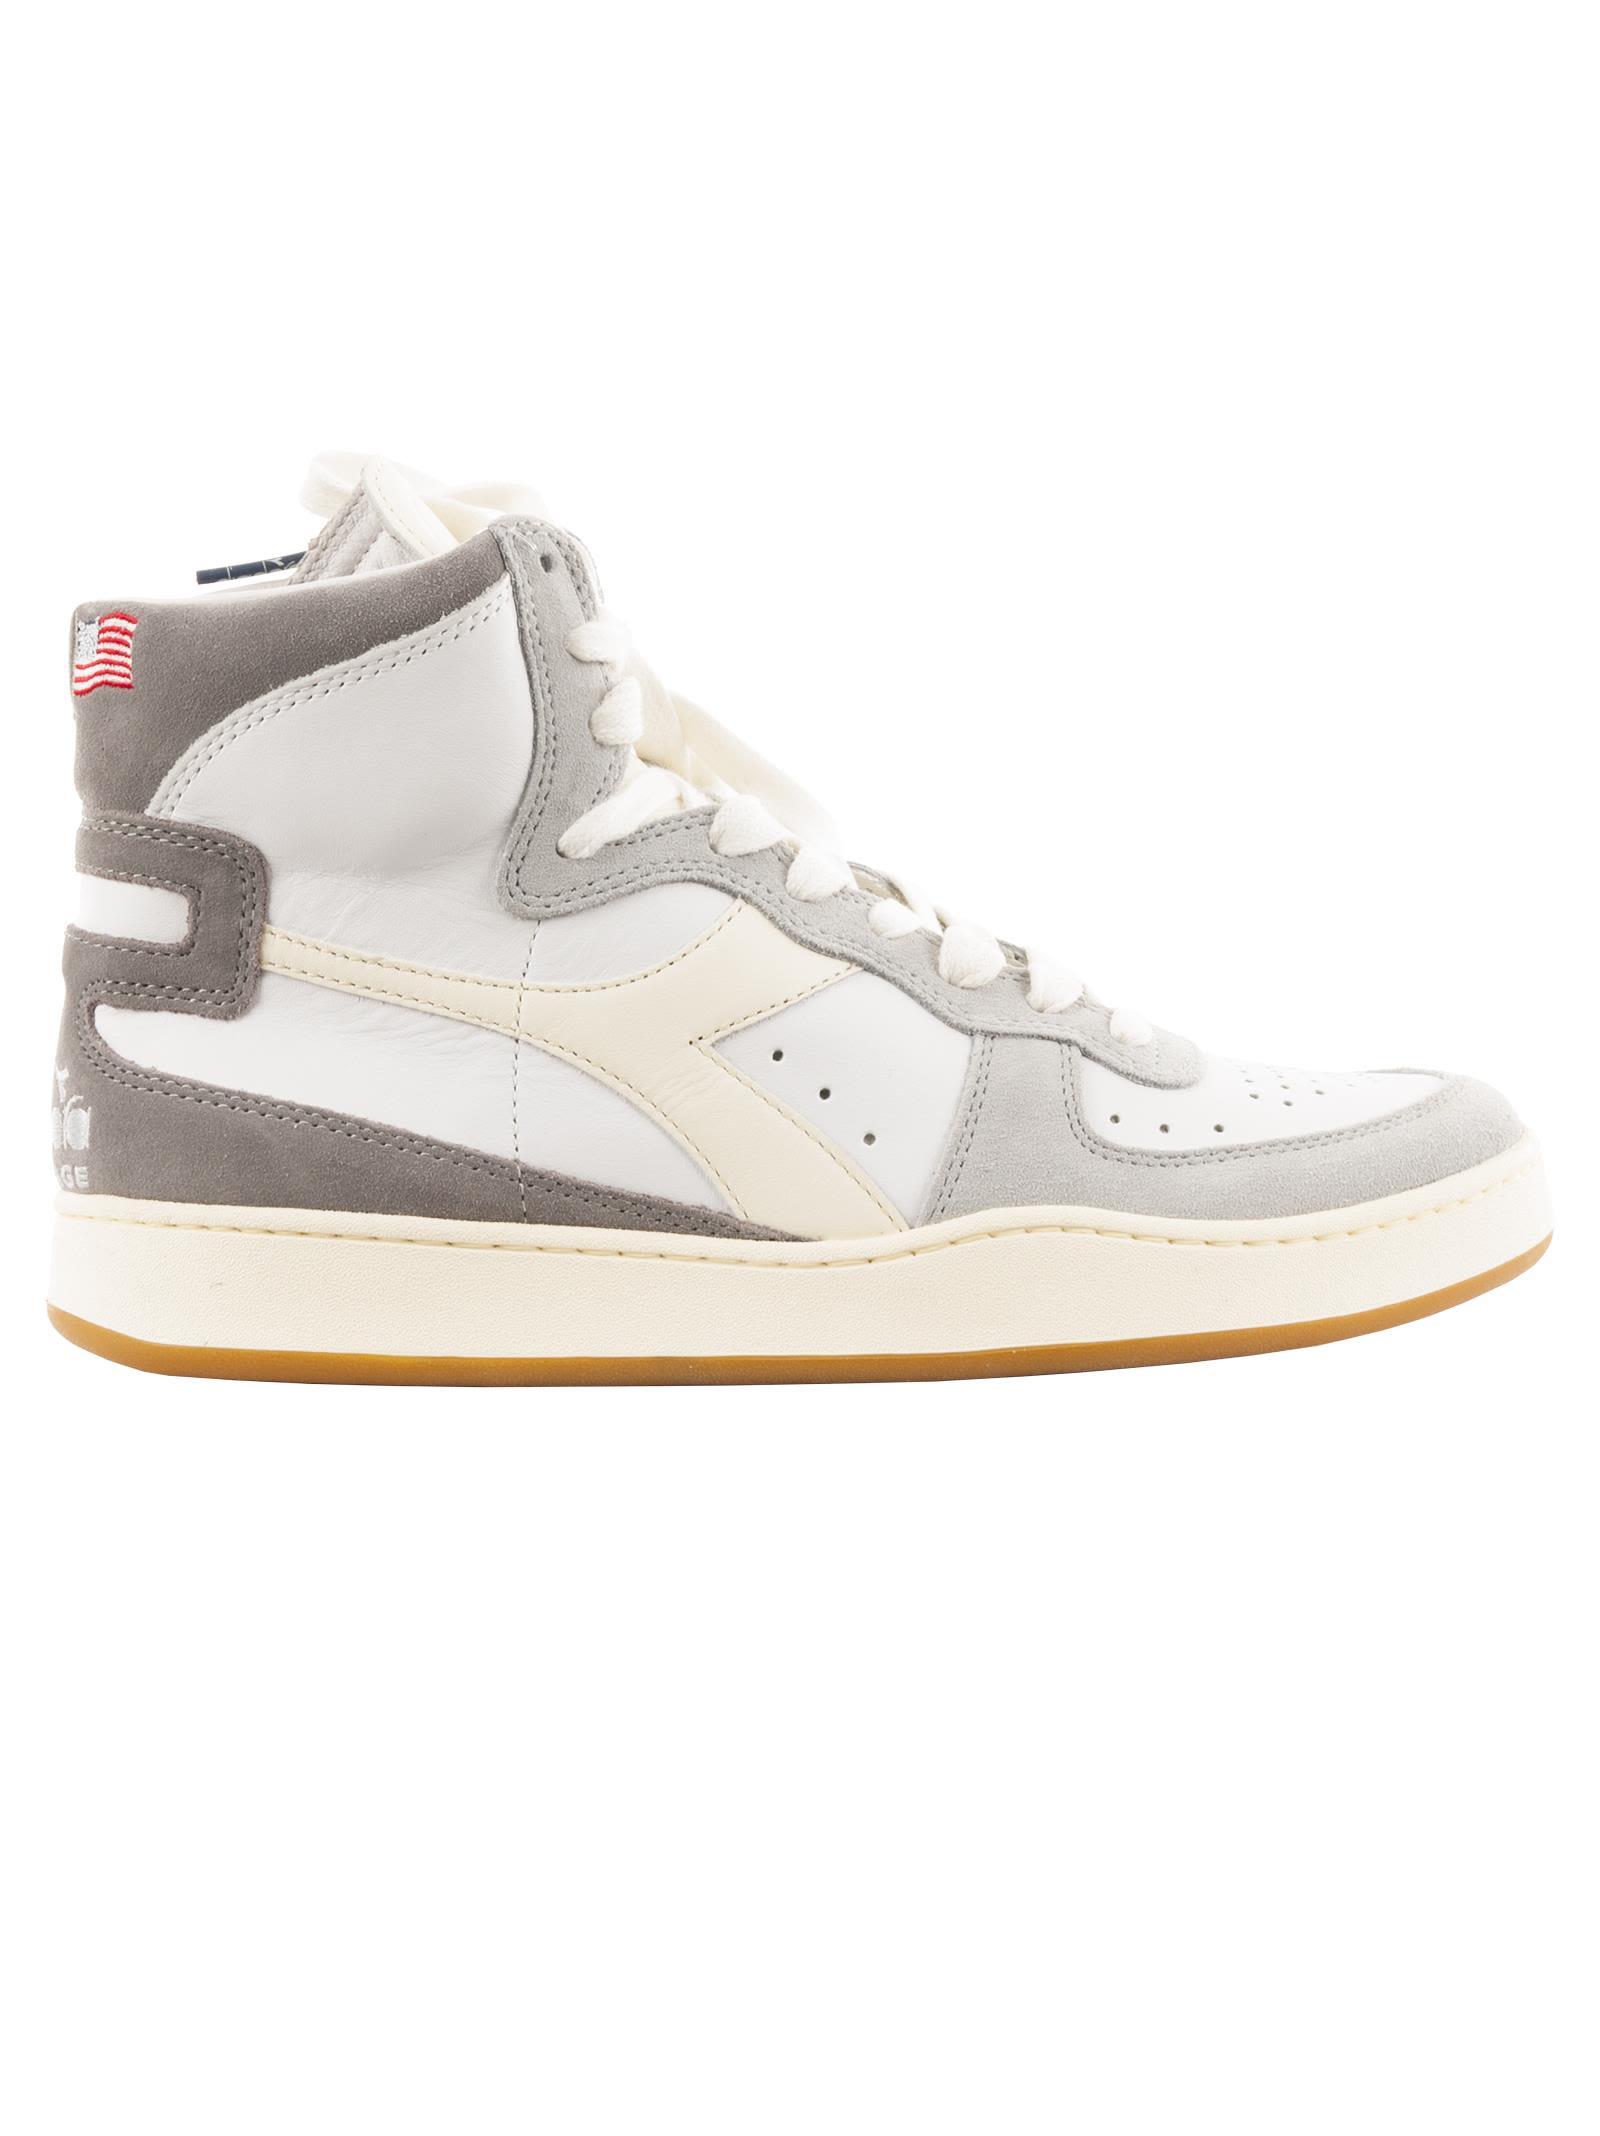 DIADORA Lc23 Mi Basket Marte Hi Top Sneakers in White